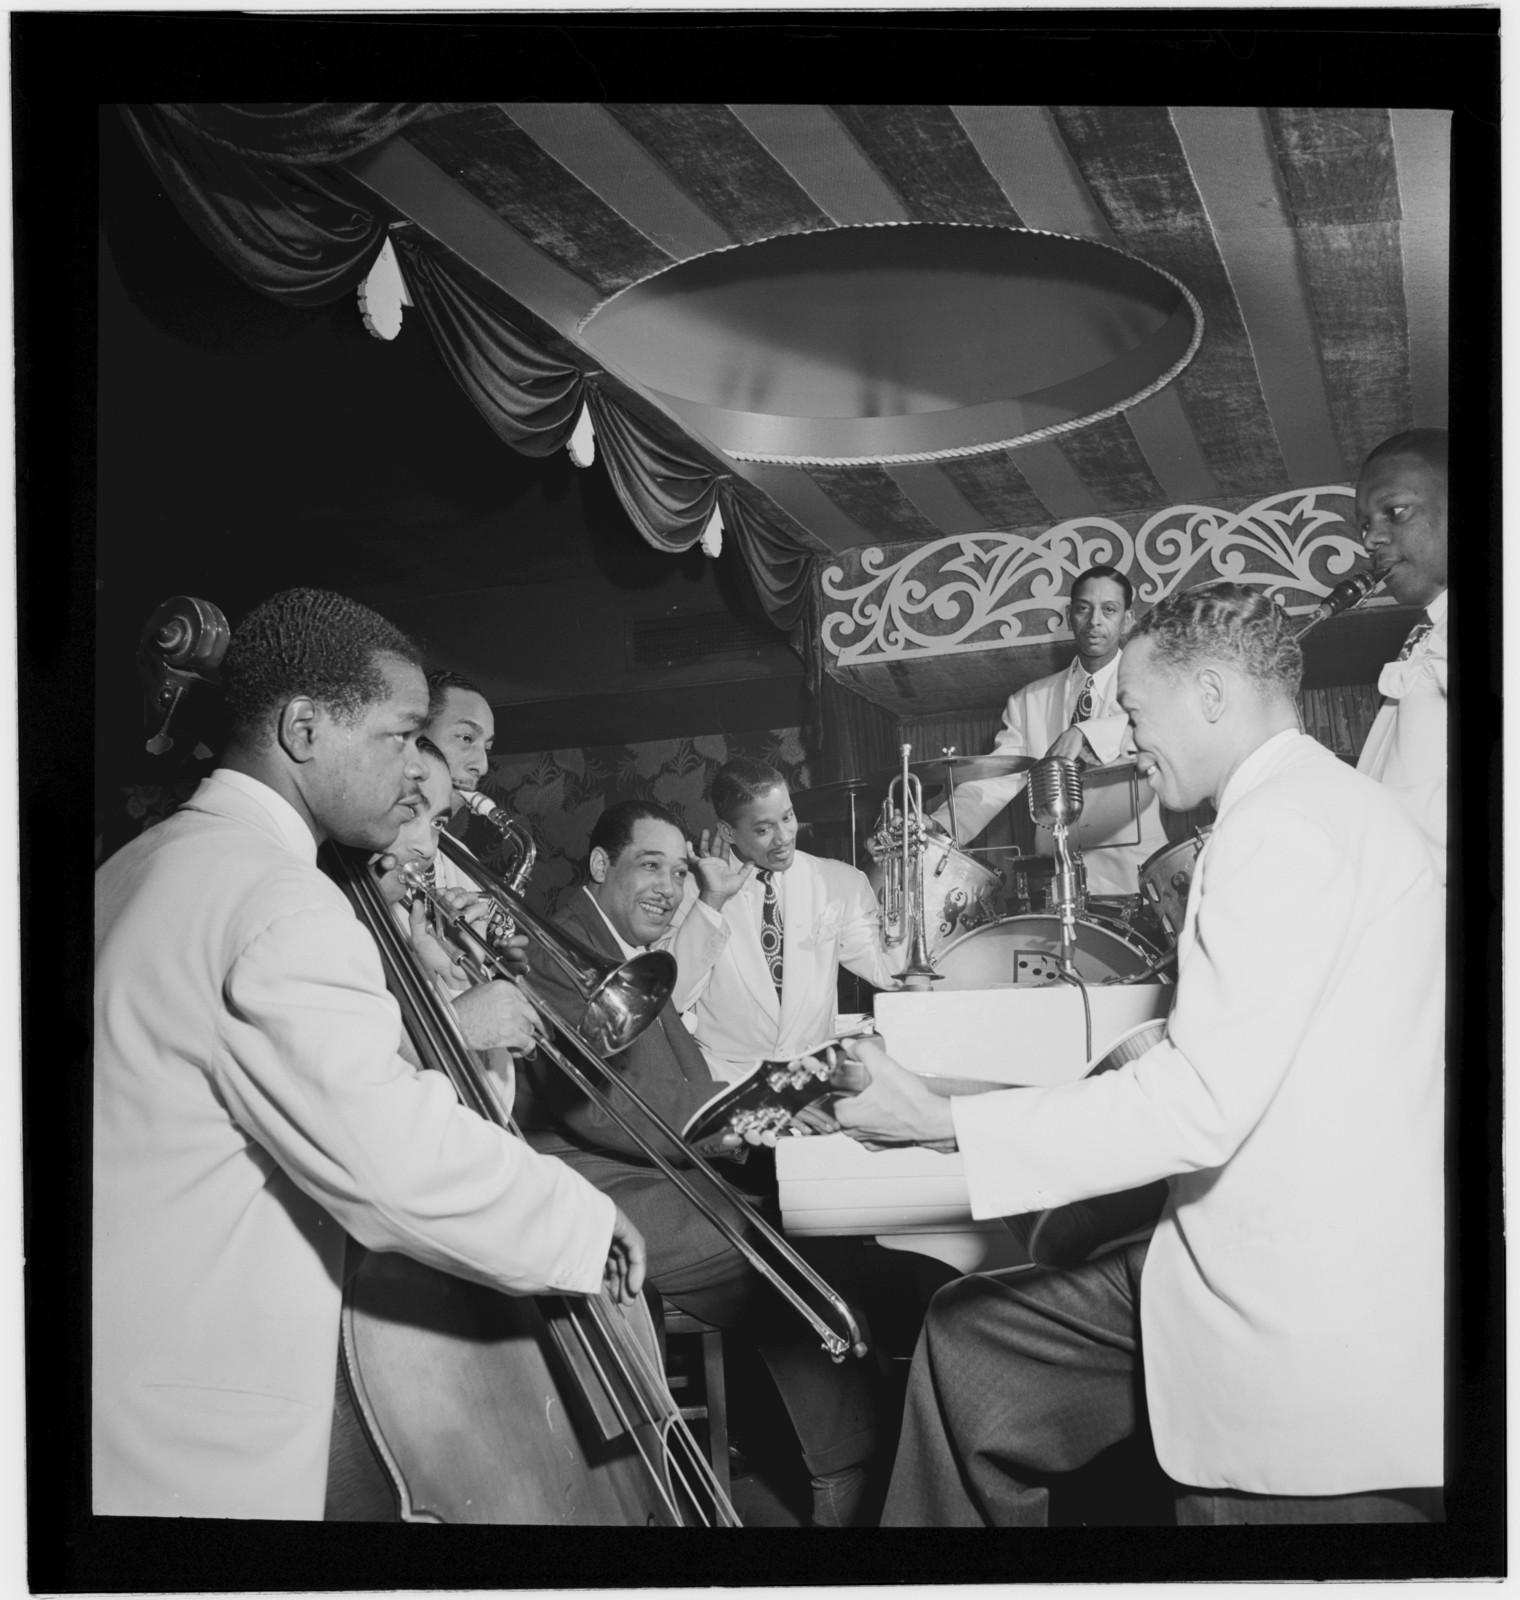 [Portrait of Junior Raglin, Lawrence Brown, Johnny Hodges, Duke Ellington, Ray Nance, Sonny Greer, Fred Guy, and Harry Carney, Aquarium, New York, N.Y., ca. Nov. 1946]